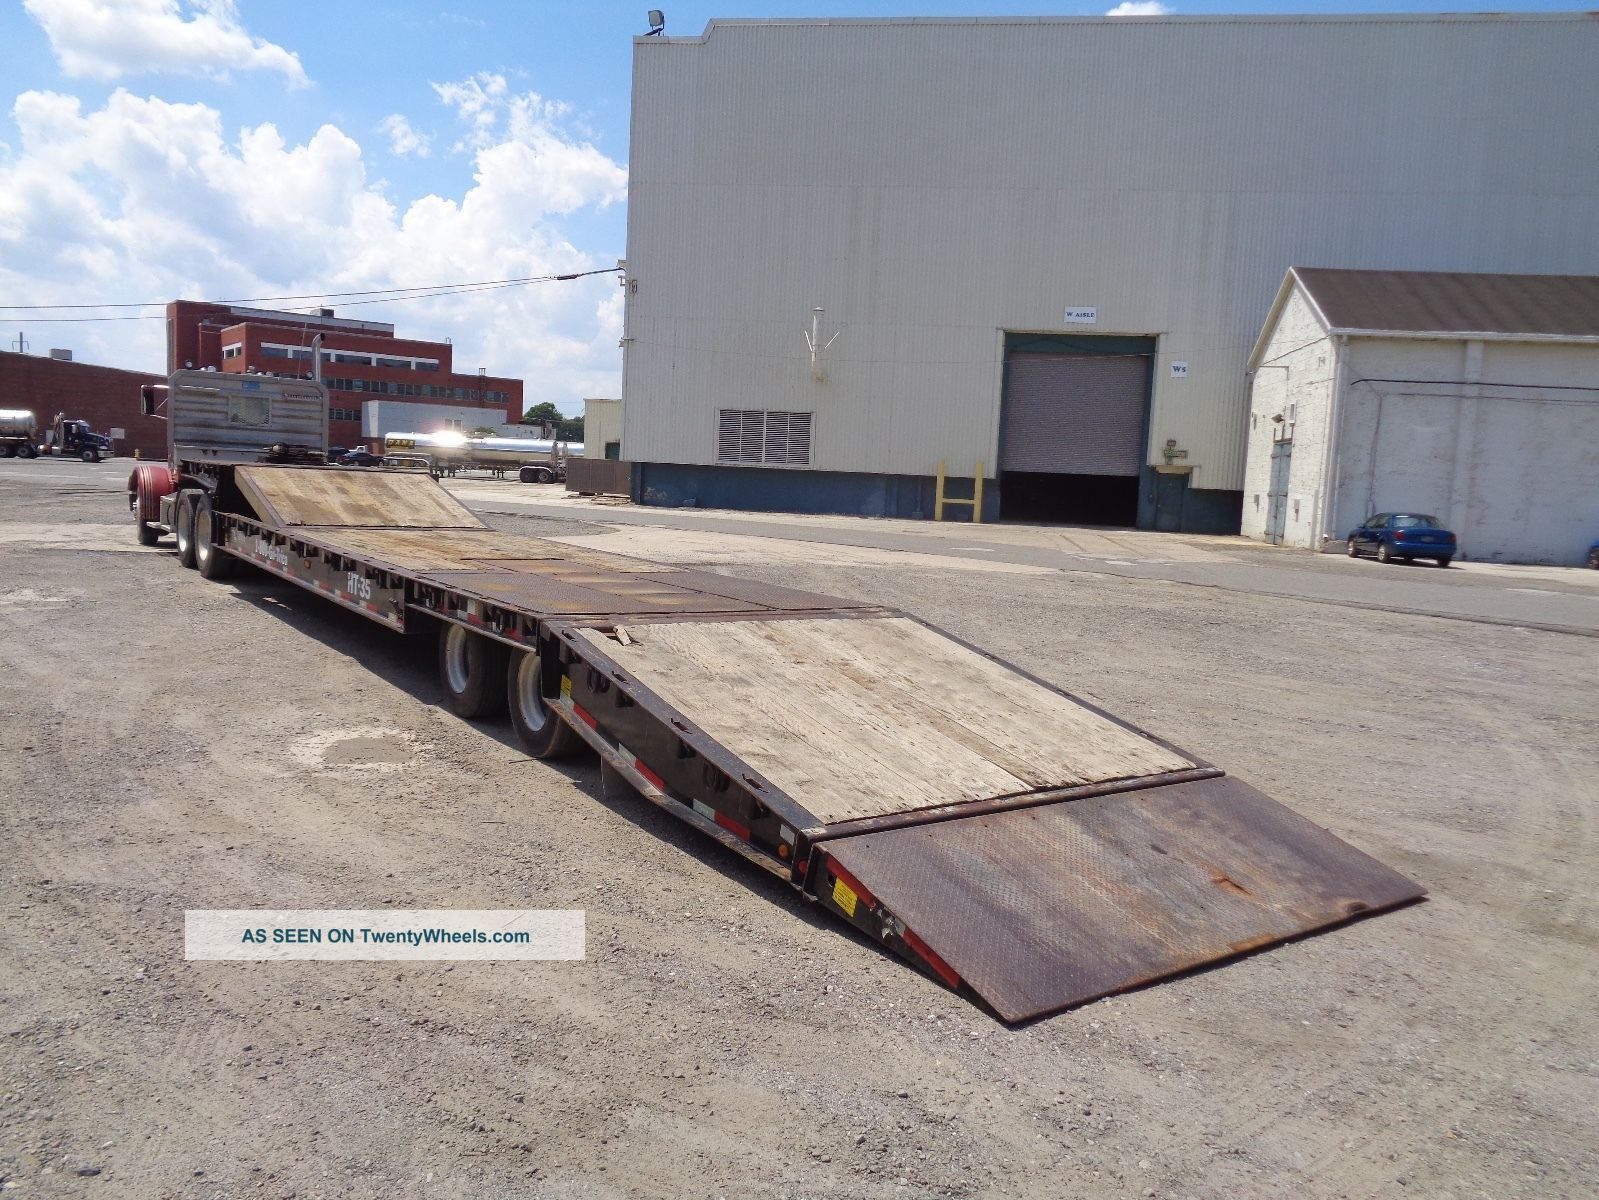 2009 Talbert 35ht 35 Ton Hydraulic Tilting Rollback Equipment Step Deck Trailer Trailers photo